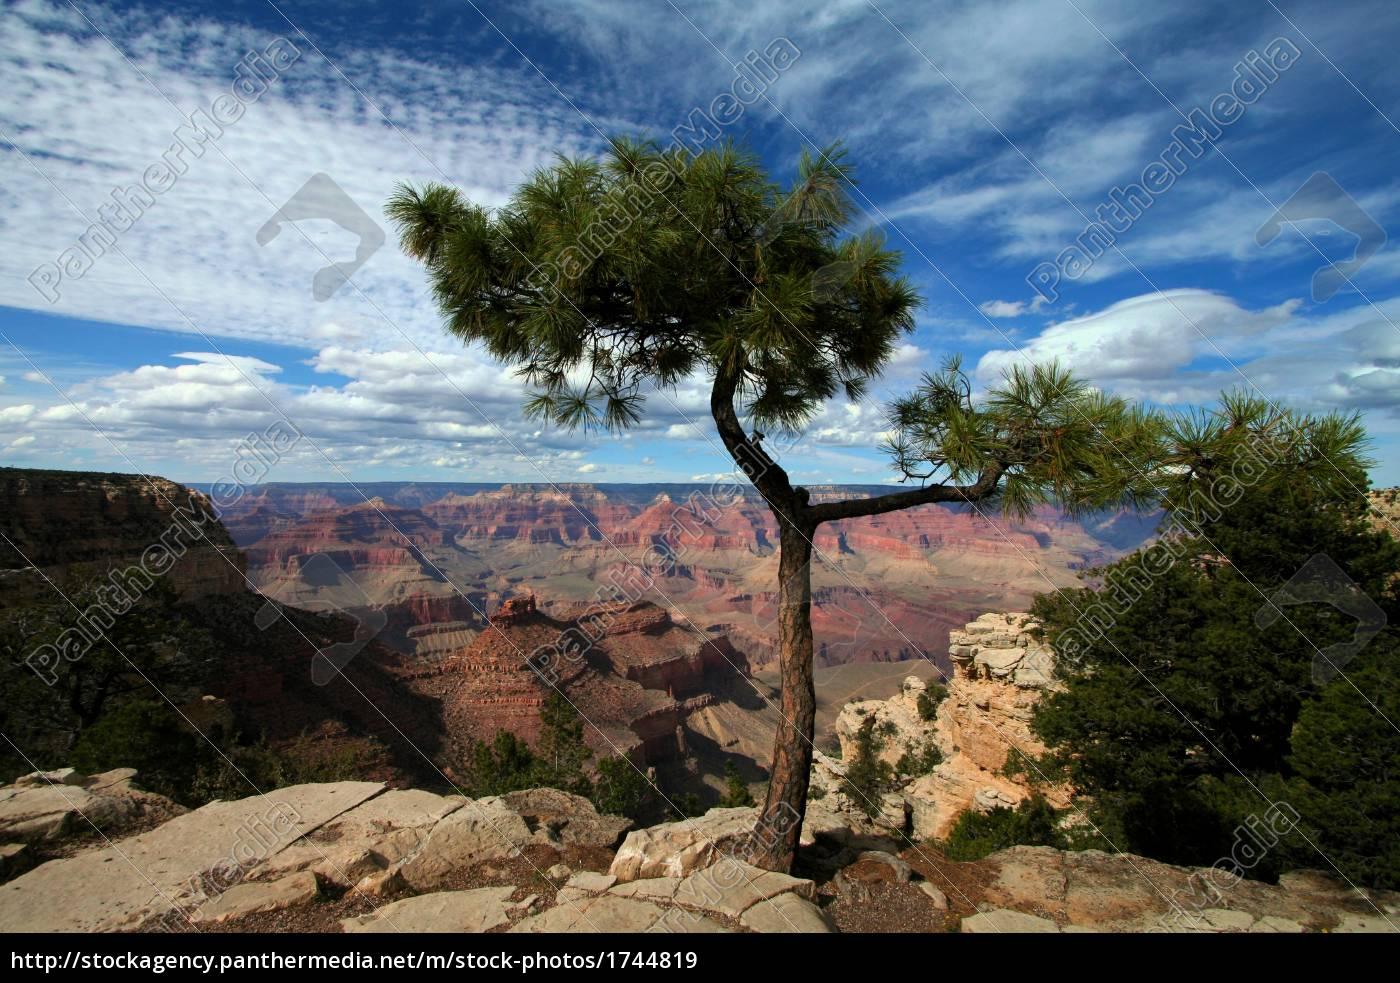 grand, canyon, 5-2007 - 1744819